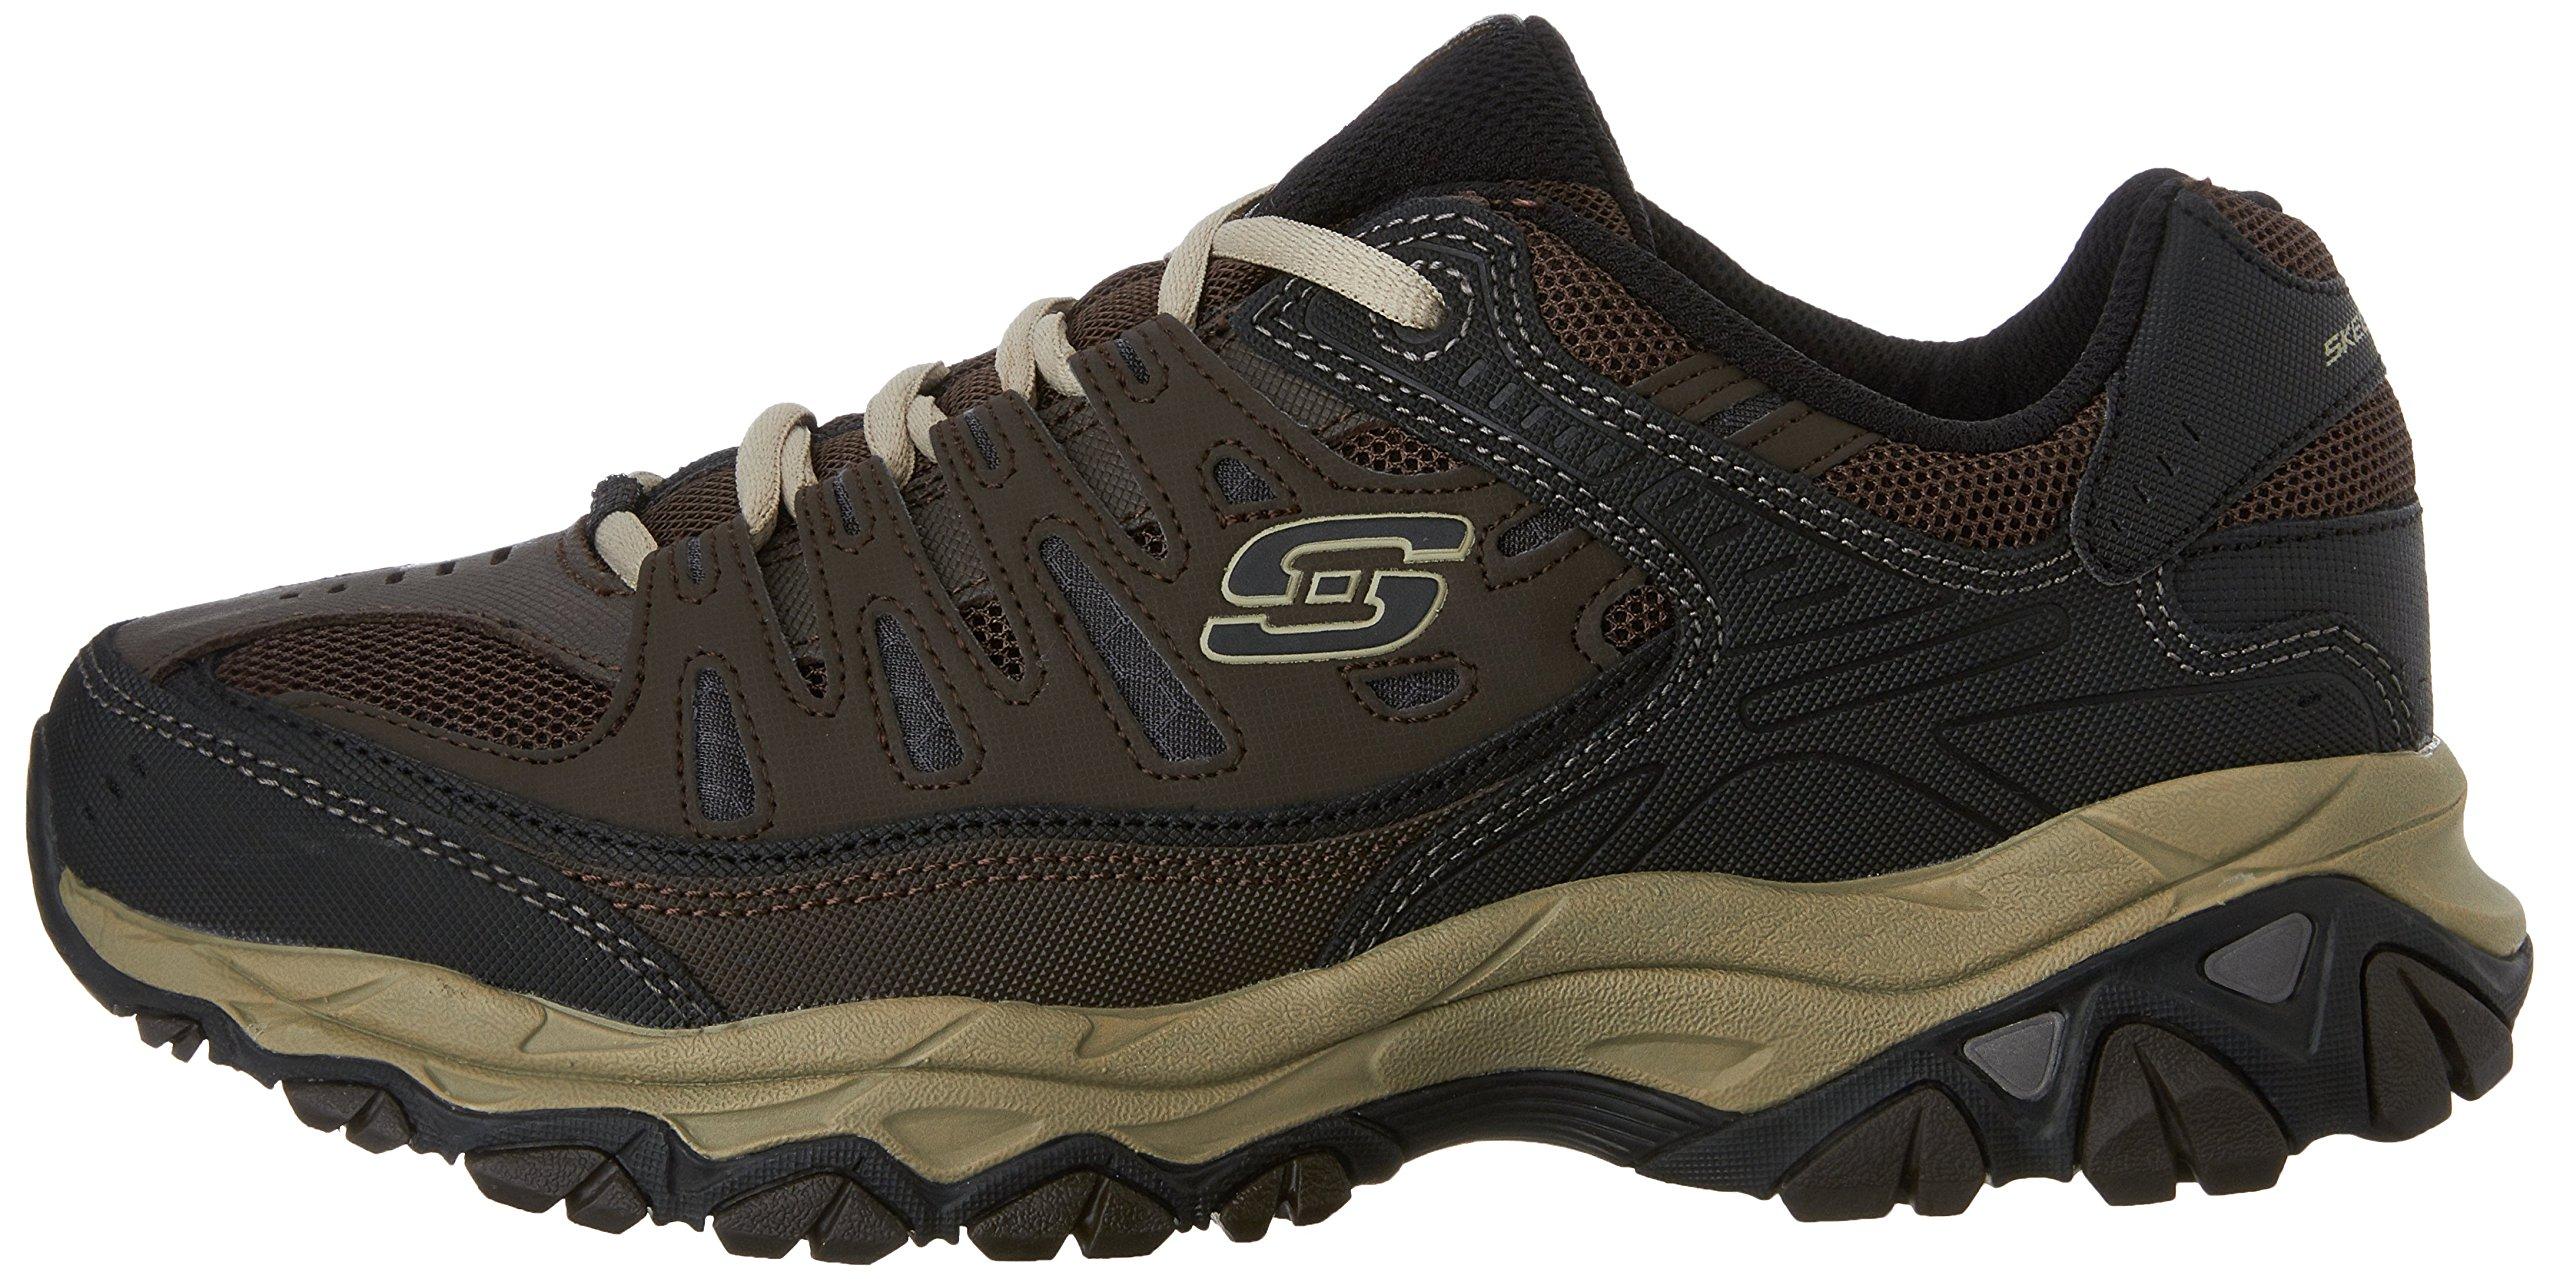 Skechers Men's AFTERBURNM.FIT Memory Foam Lace-Up Sneaker, Brown/Taupe, 7.5 M US by Skechers (Image #5)